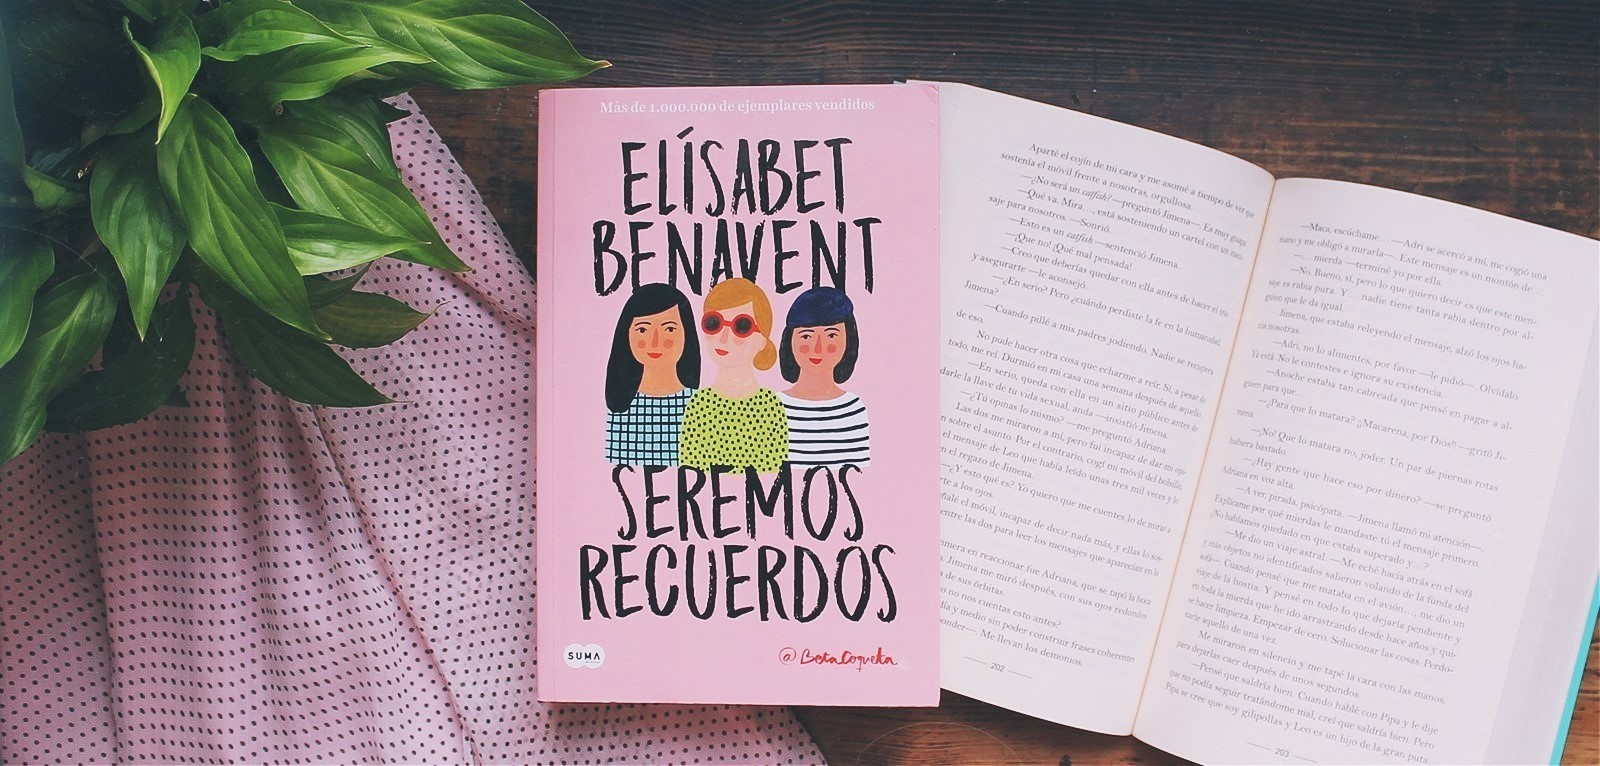 Seremos Recuerdos · Elisabet Benavent